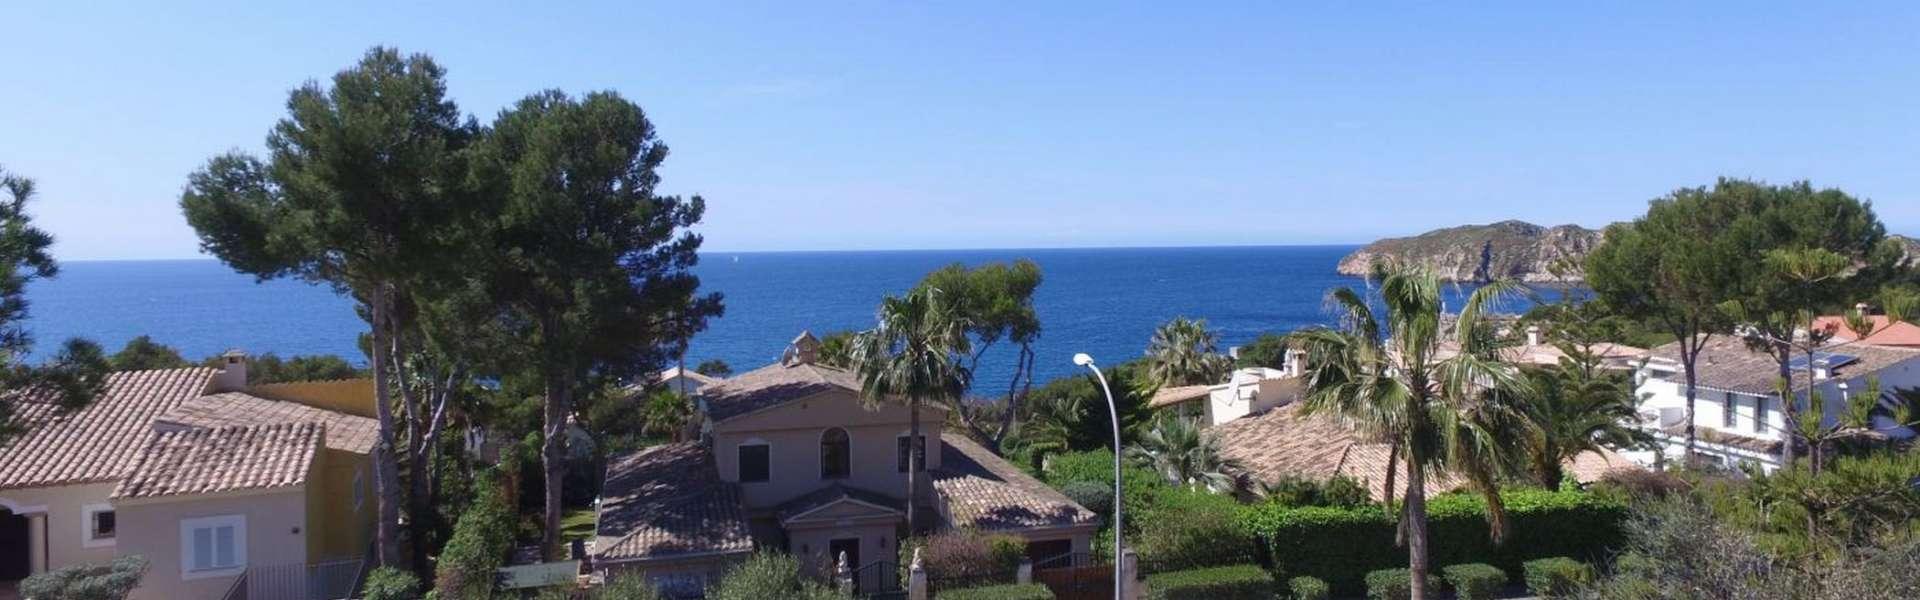 Santa Ponsa - Neubauvilla mit traumhaftem Meerblick und mediterranem Charme